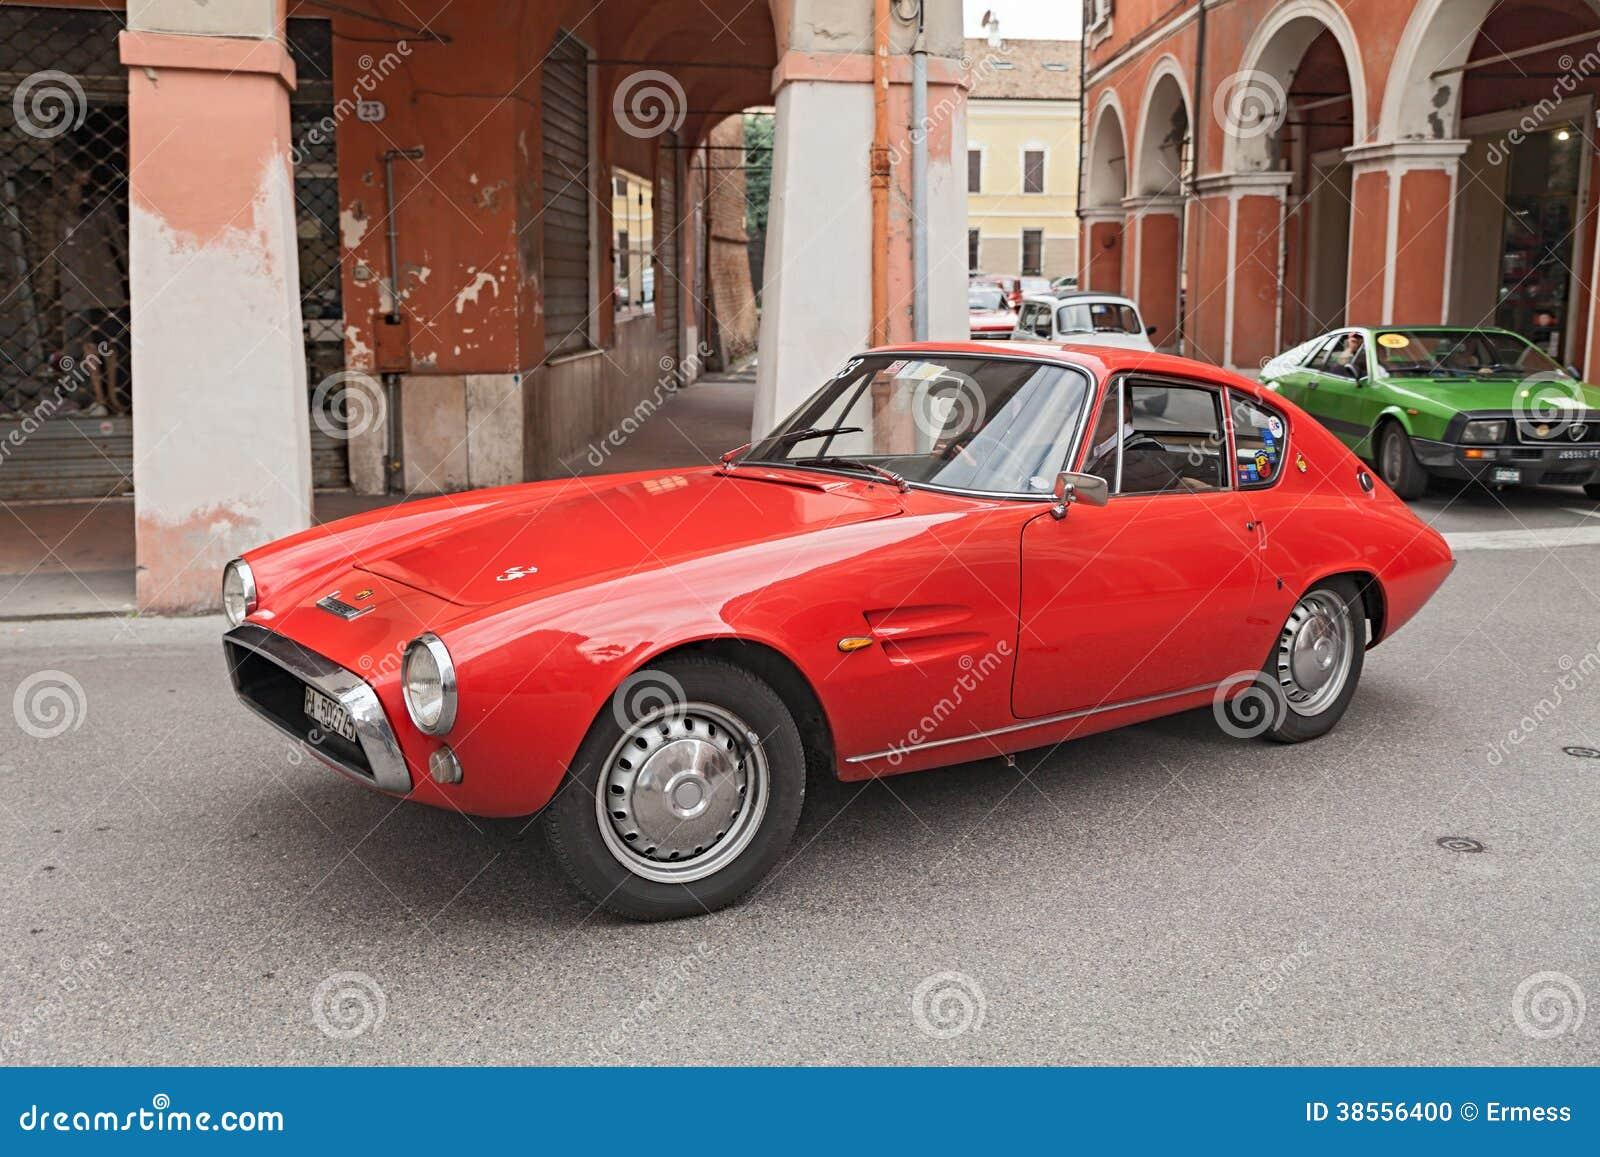 Vintage Italian Car Abarth 1500 Editorial Image Image Of Design